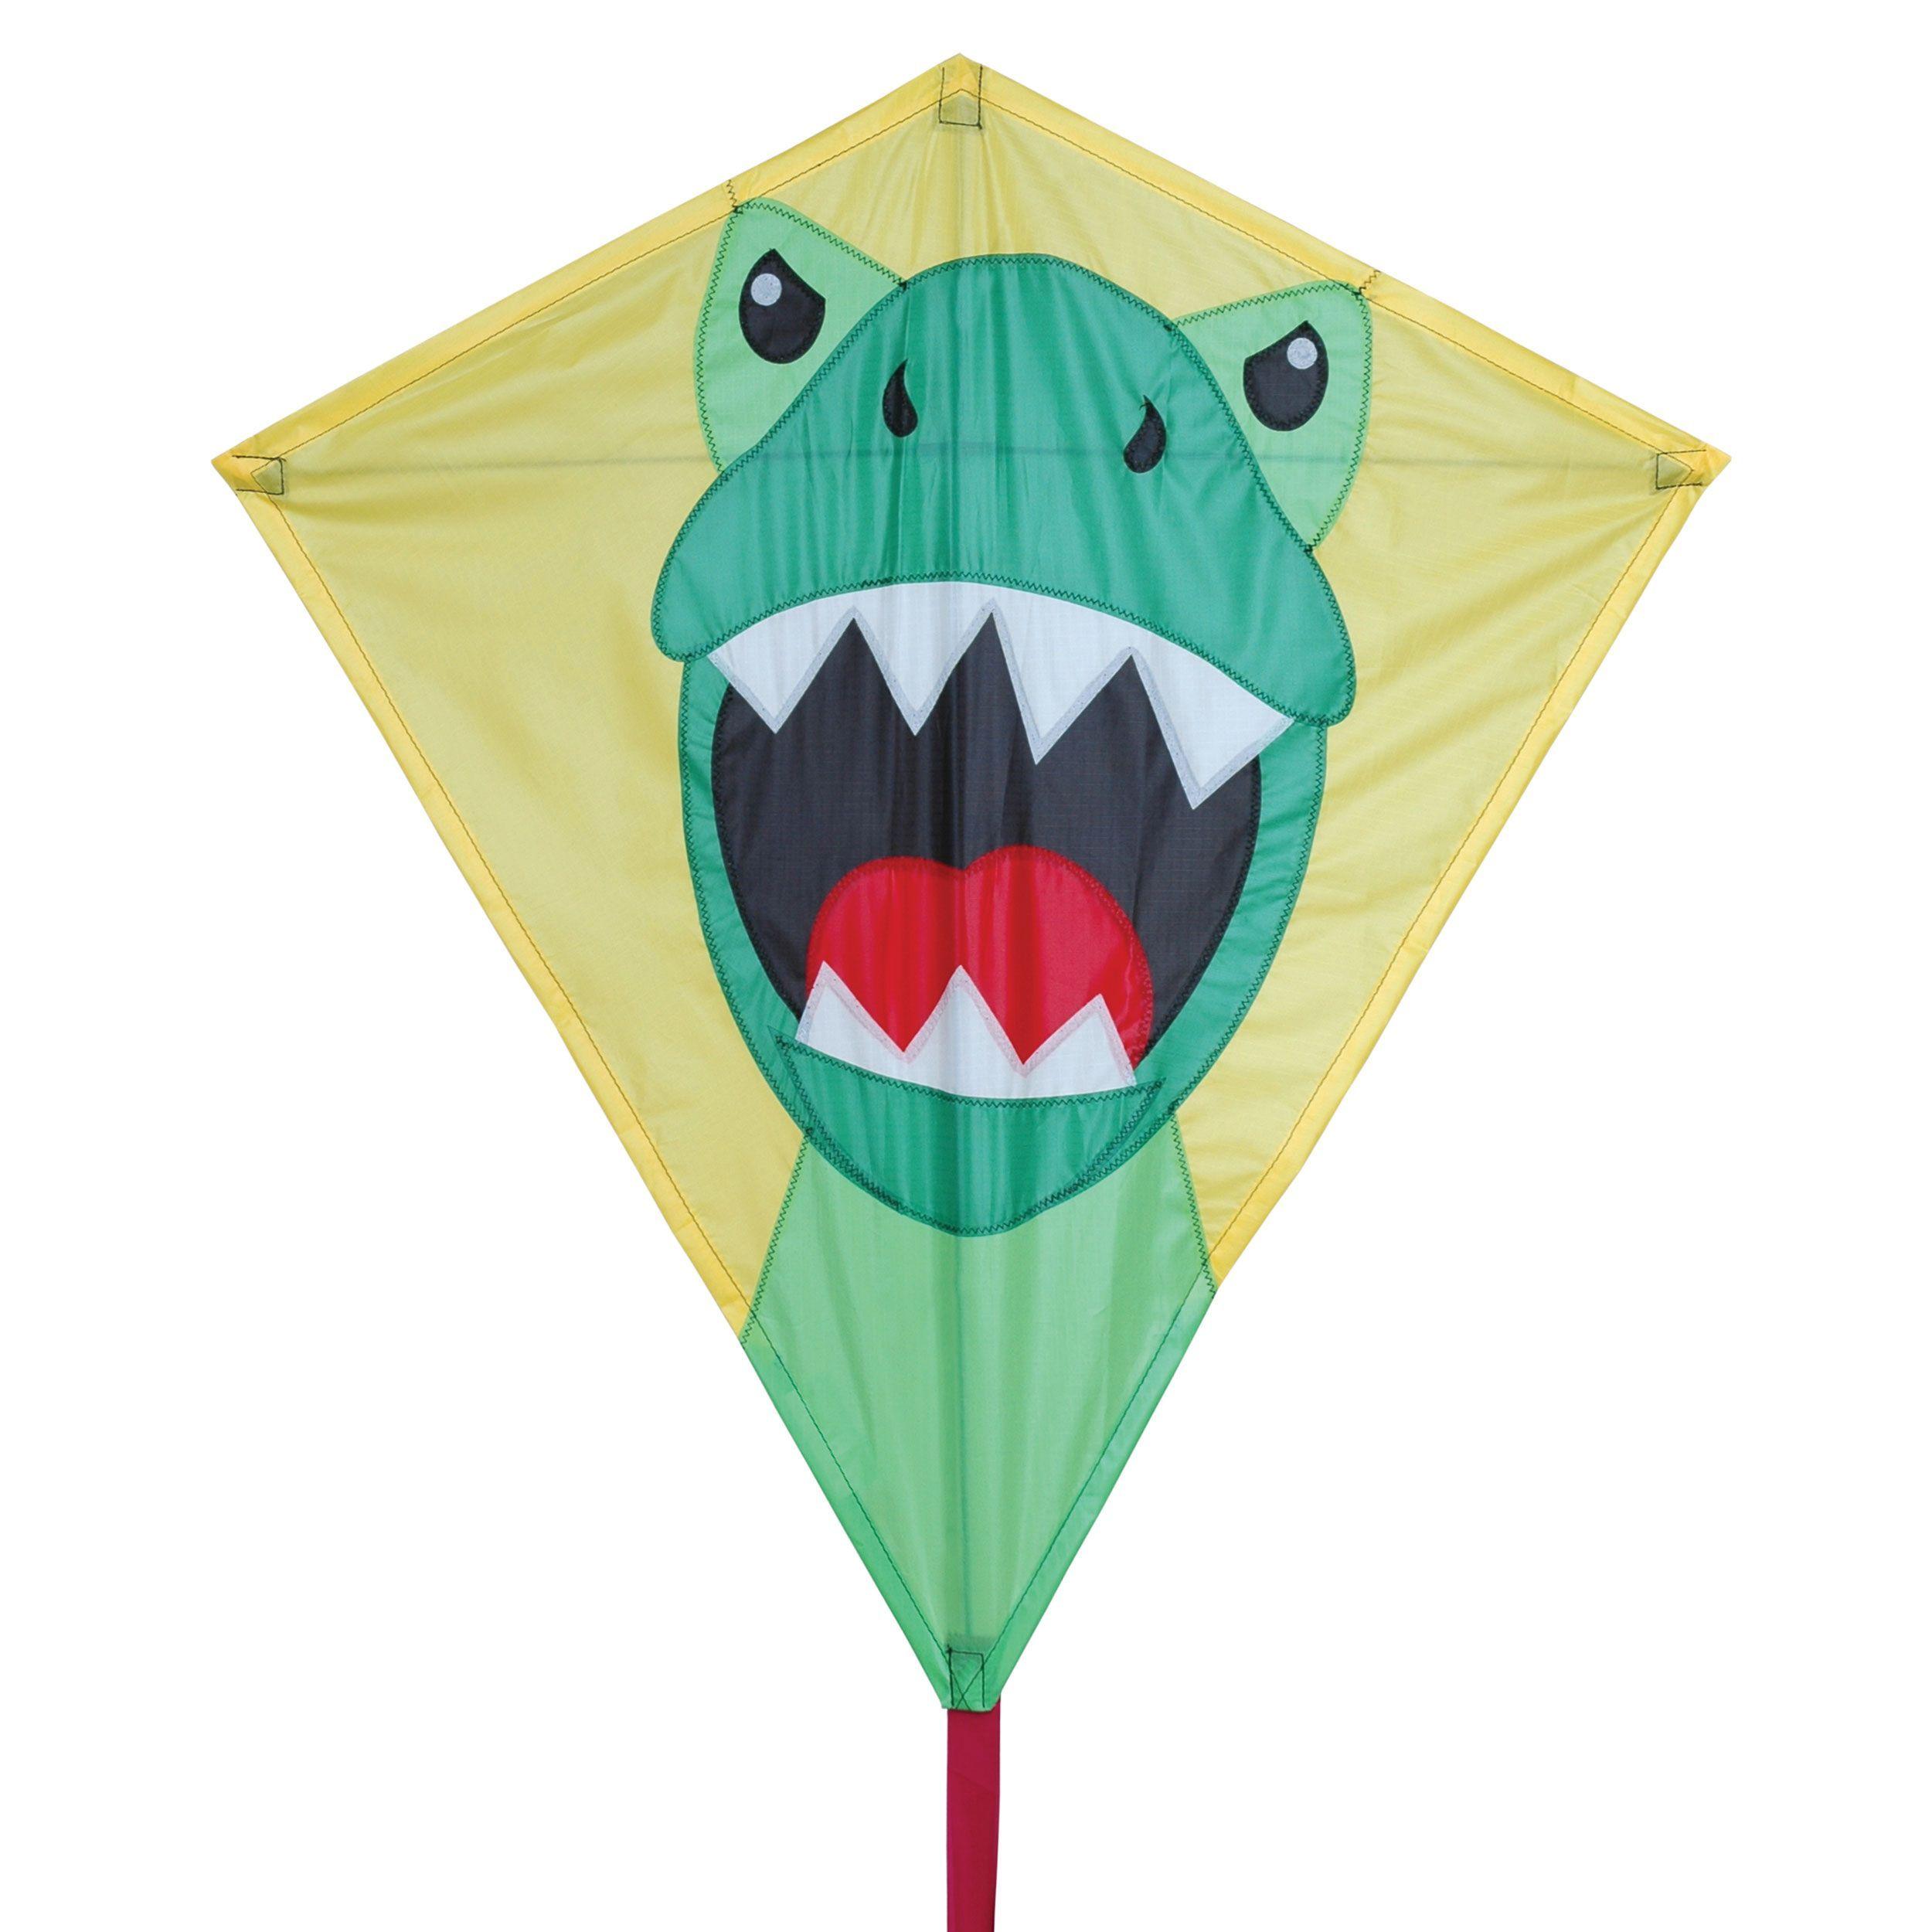 Premier Dino 30-inch Diamond Kite